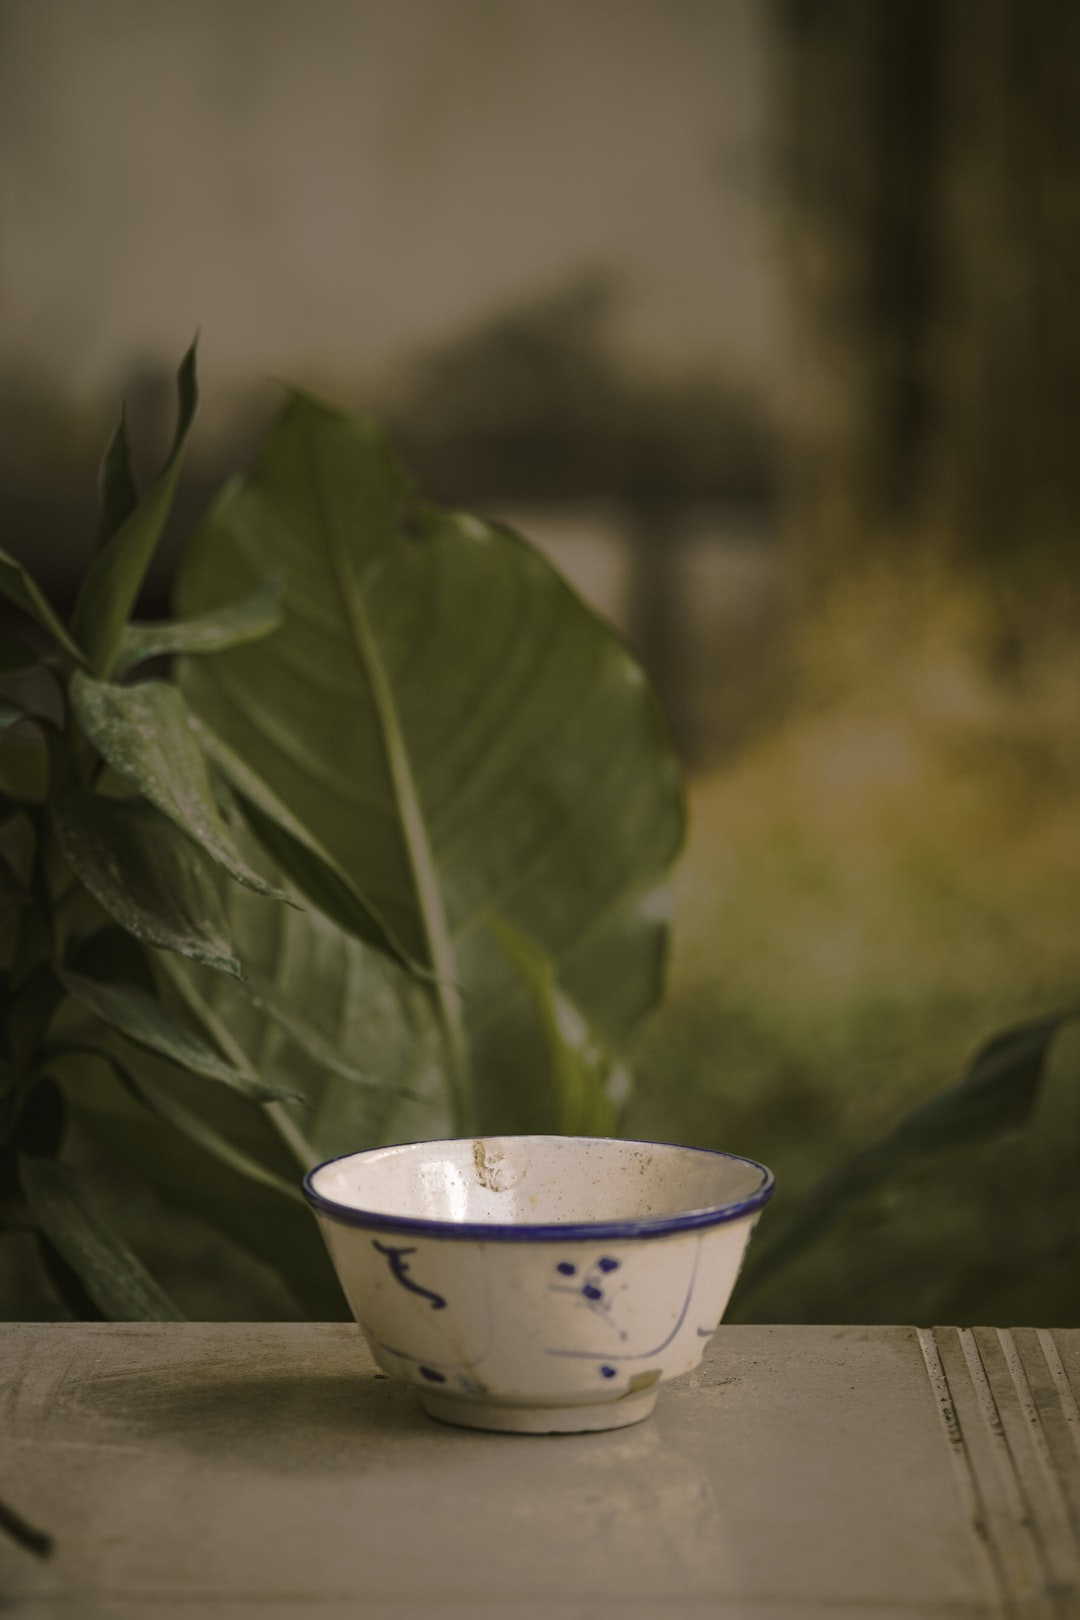 Bowl of calmness